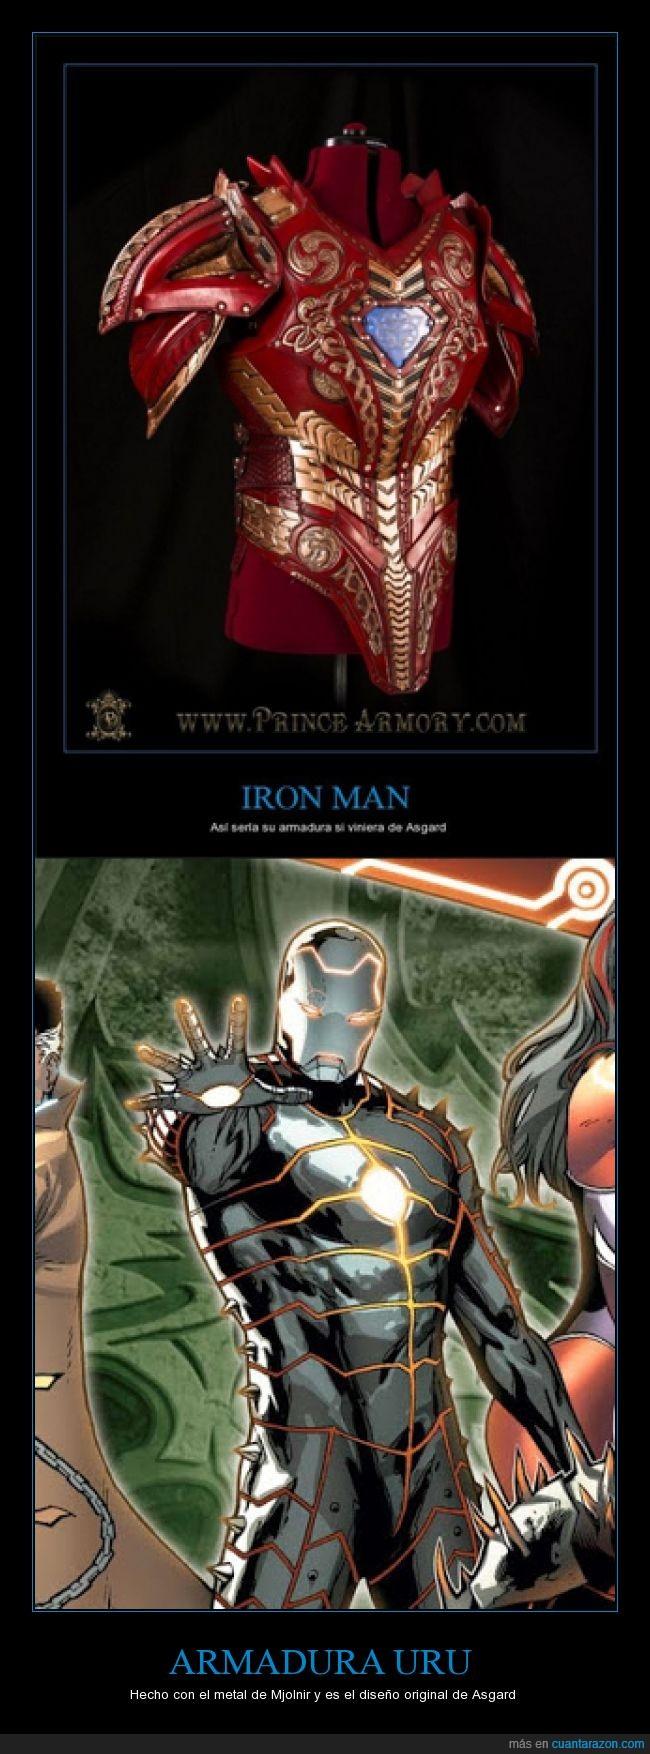 armadura,Comics,Iron Man,marvel,mashup,Mjolnir,Thor,traje,vengadores